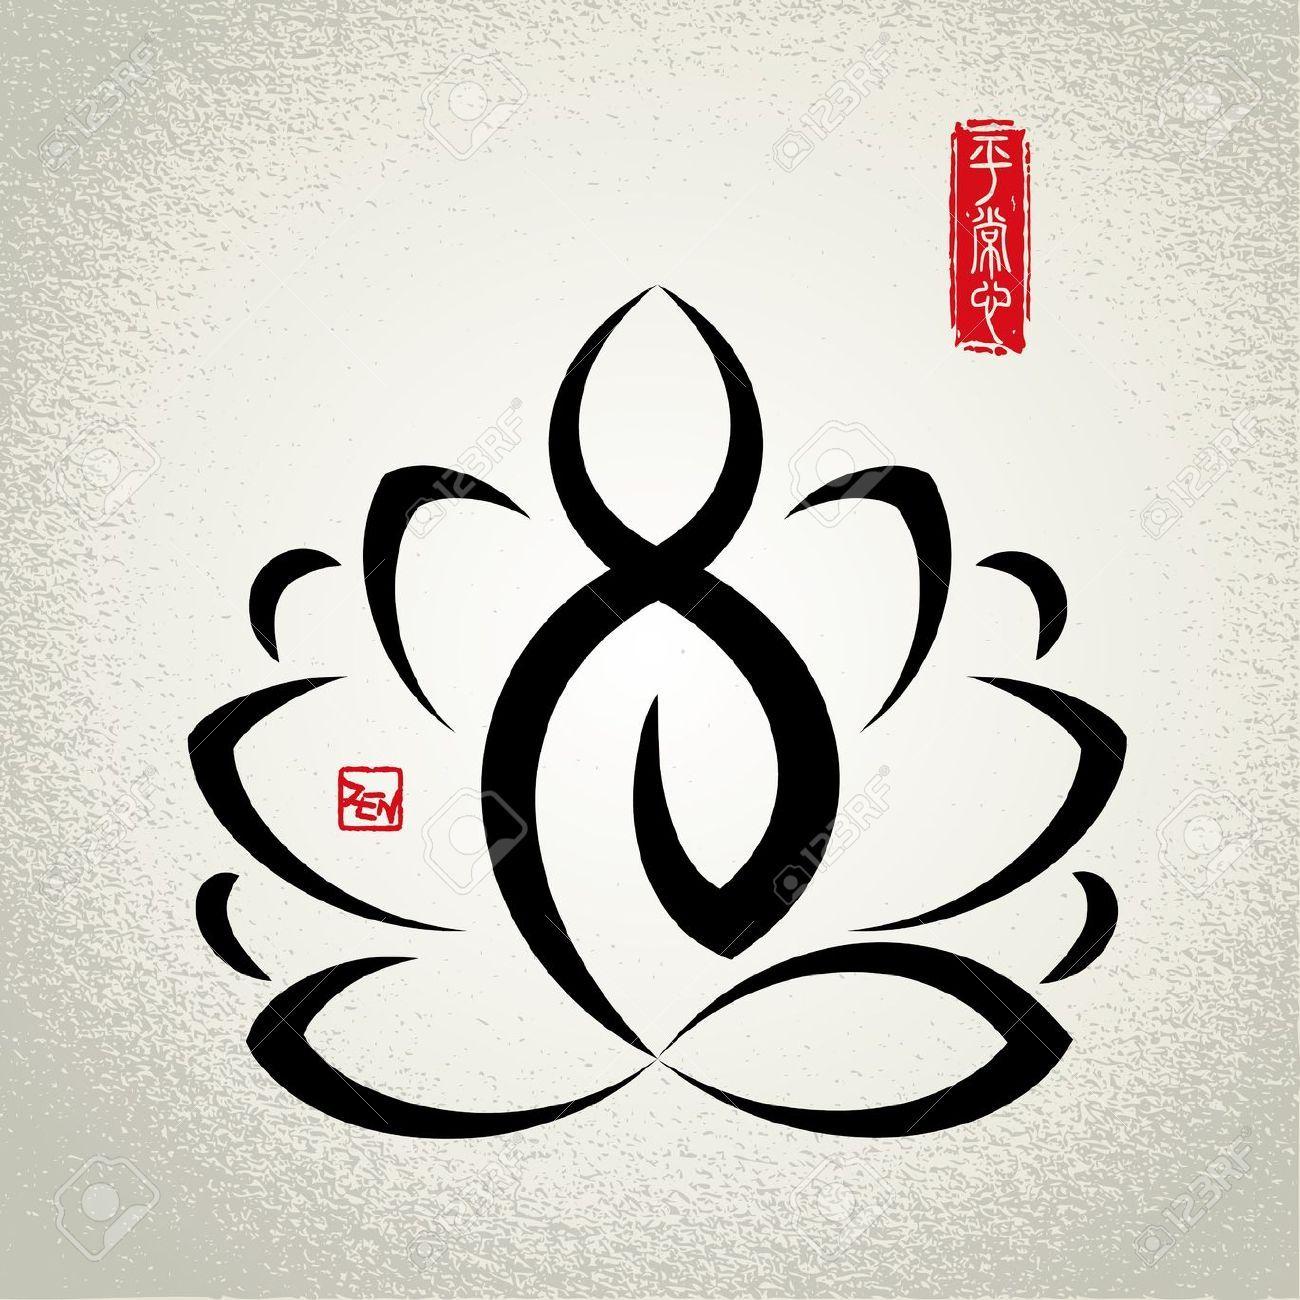 Pin By Eternal Love On Great Pinterest Logos